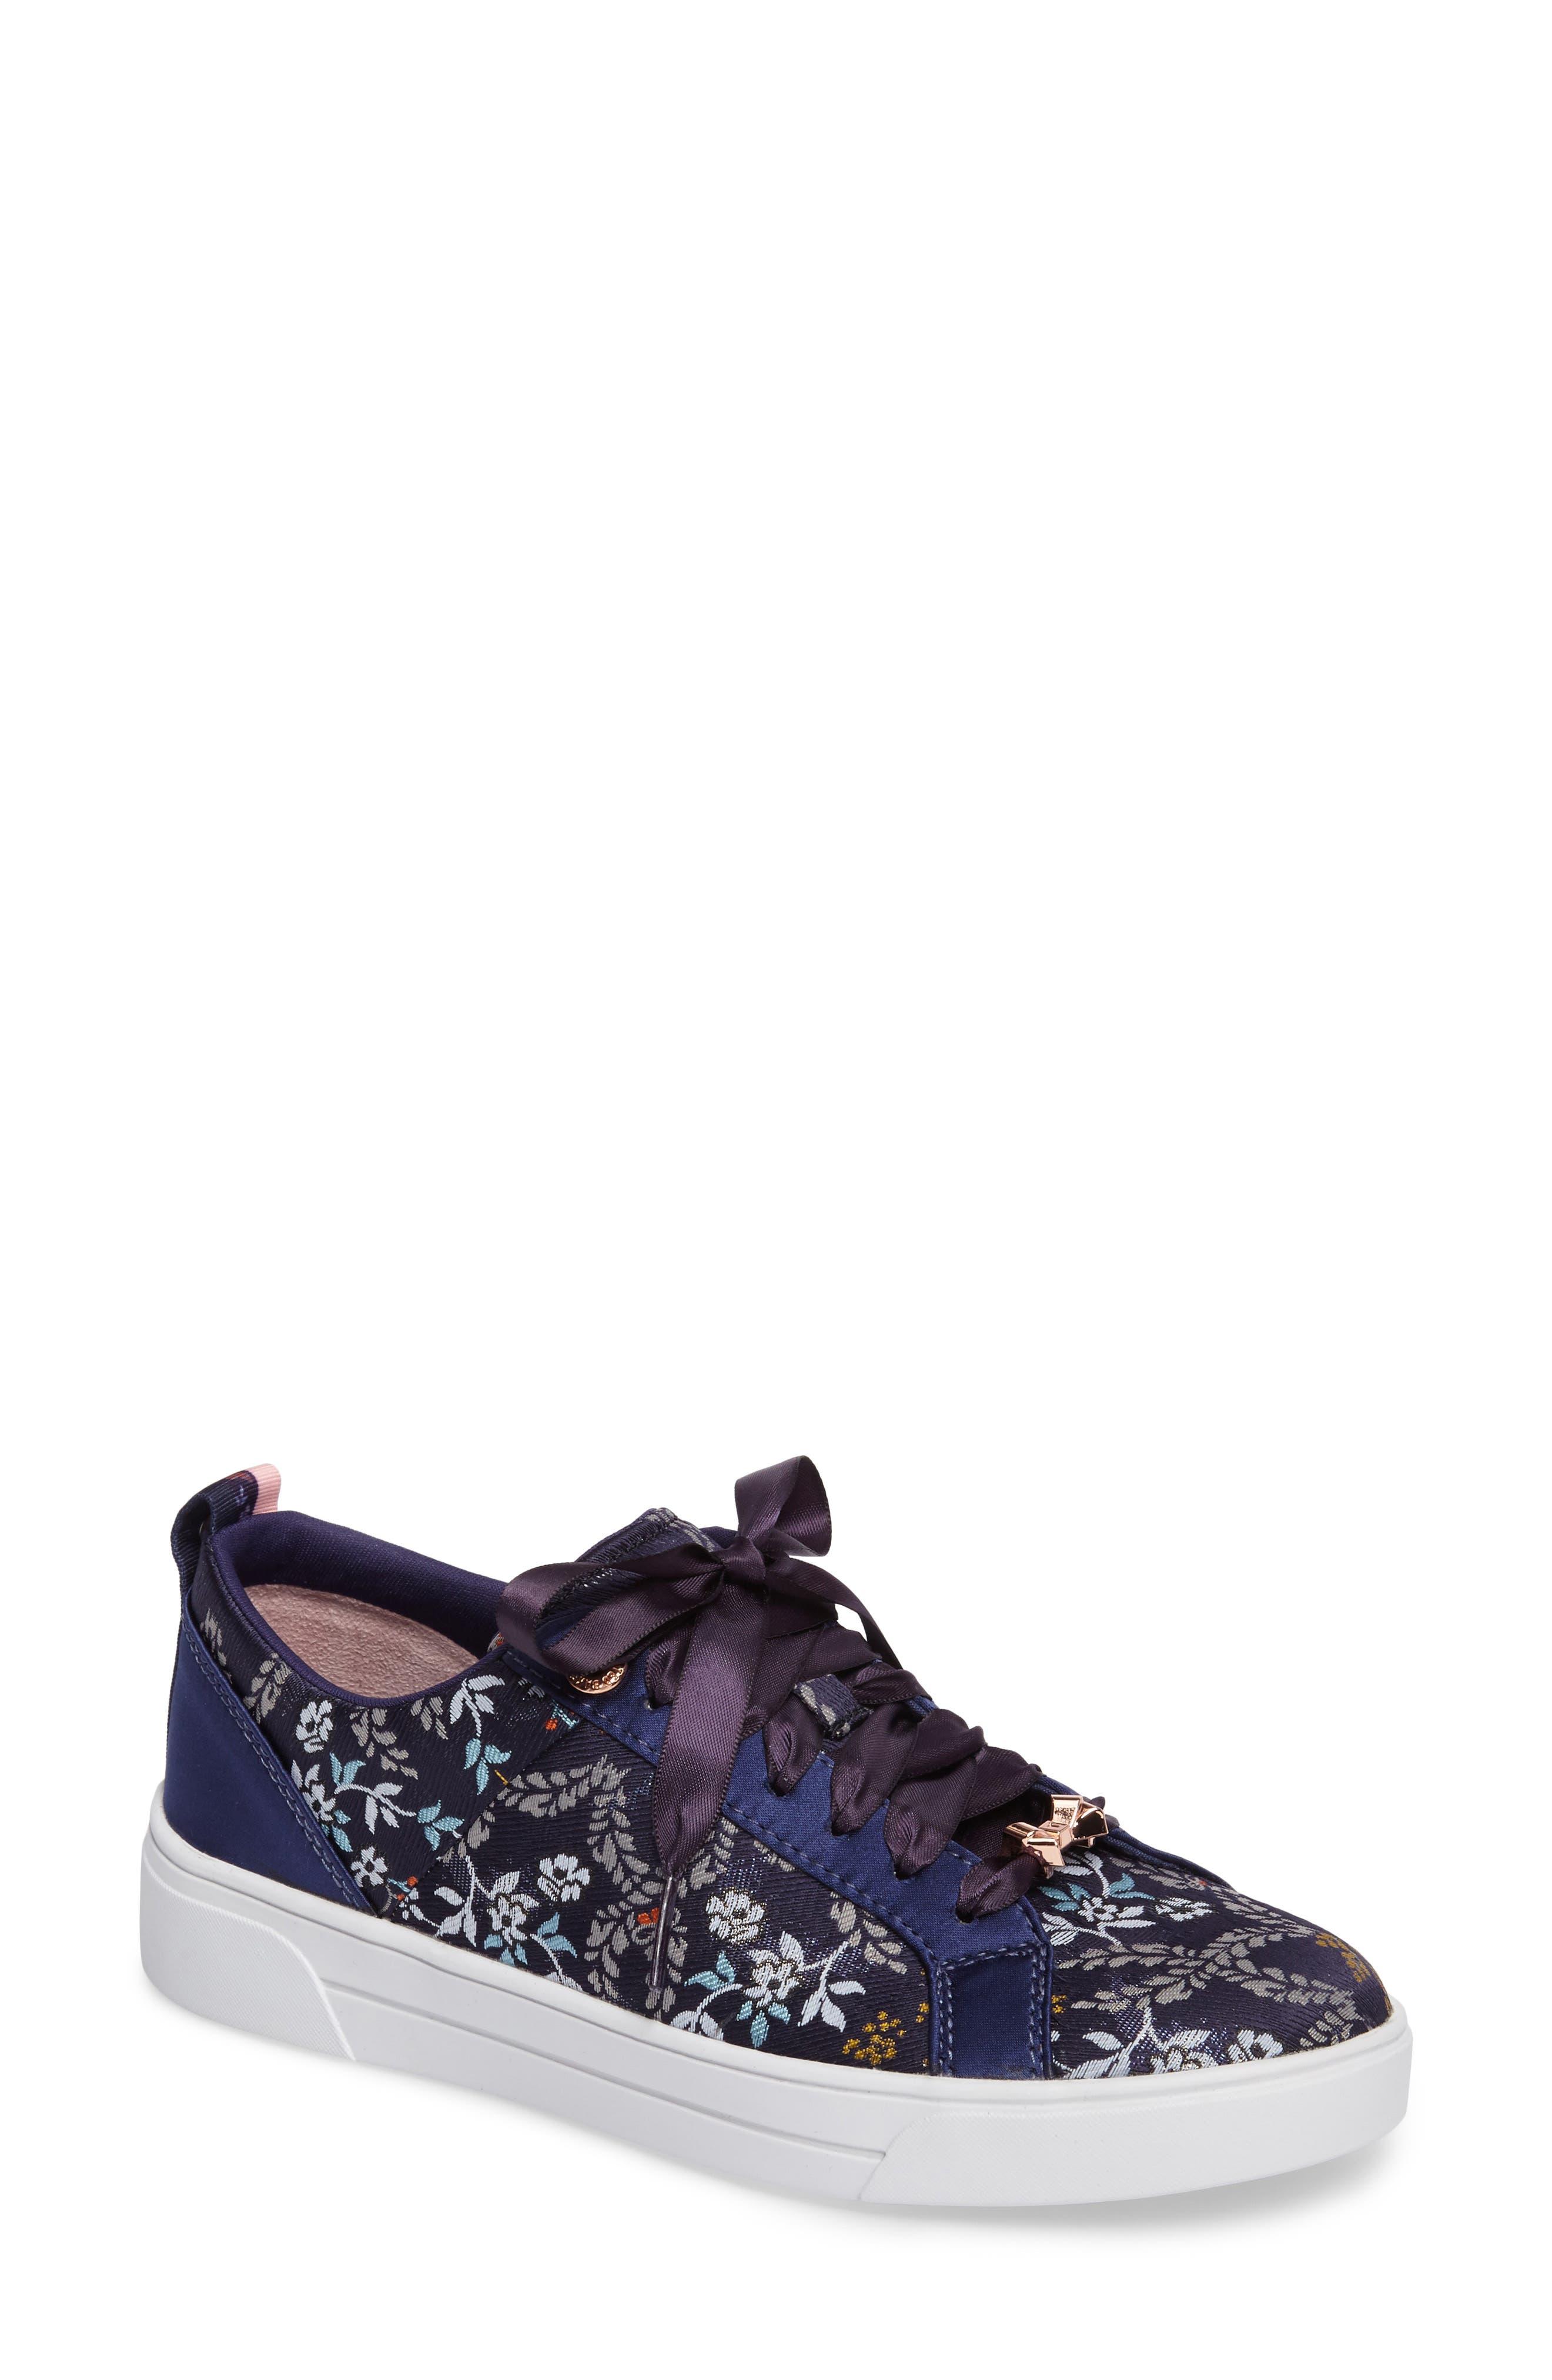 Alternate Image 1 Selected - Ted Baker London Sorcey Platform Sneaker (Women)